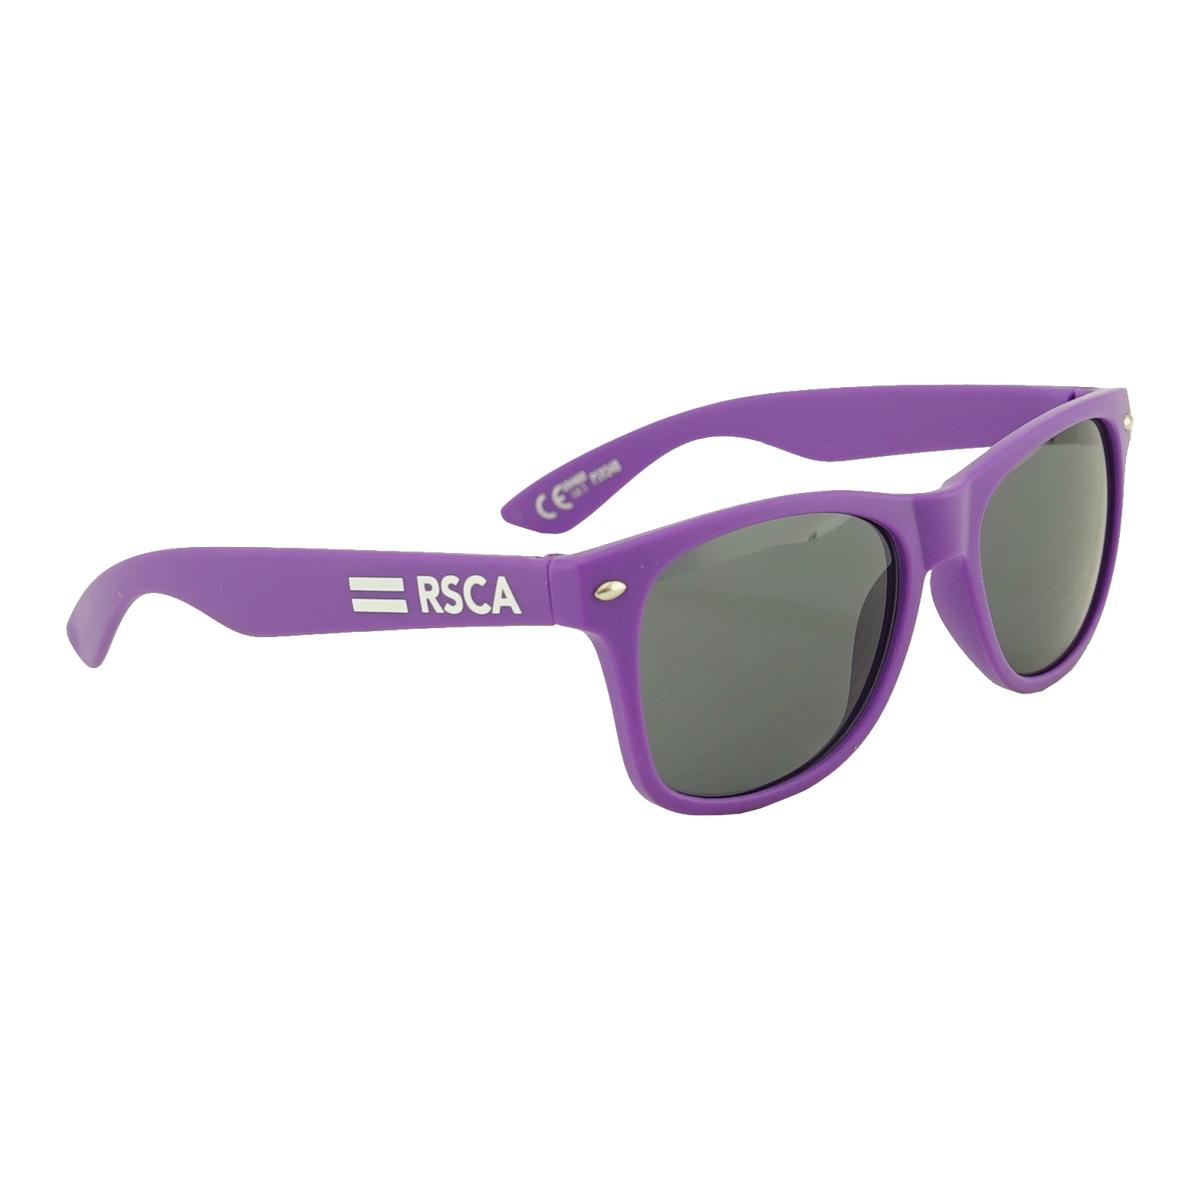 RSCA Sunglasses - Purple